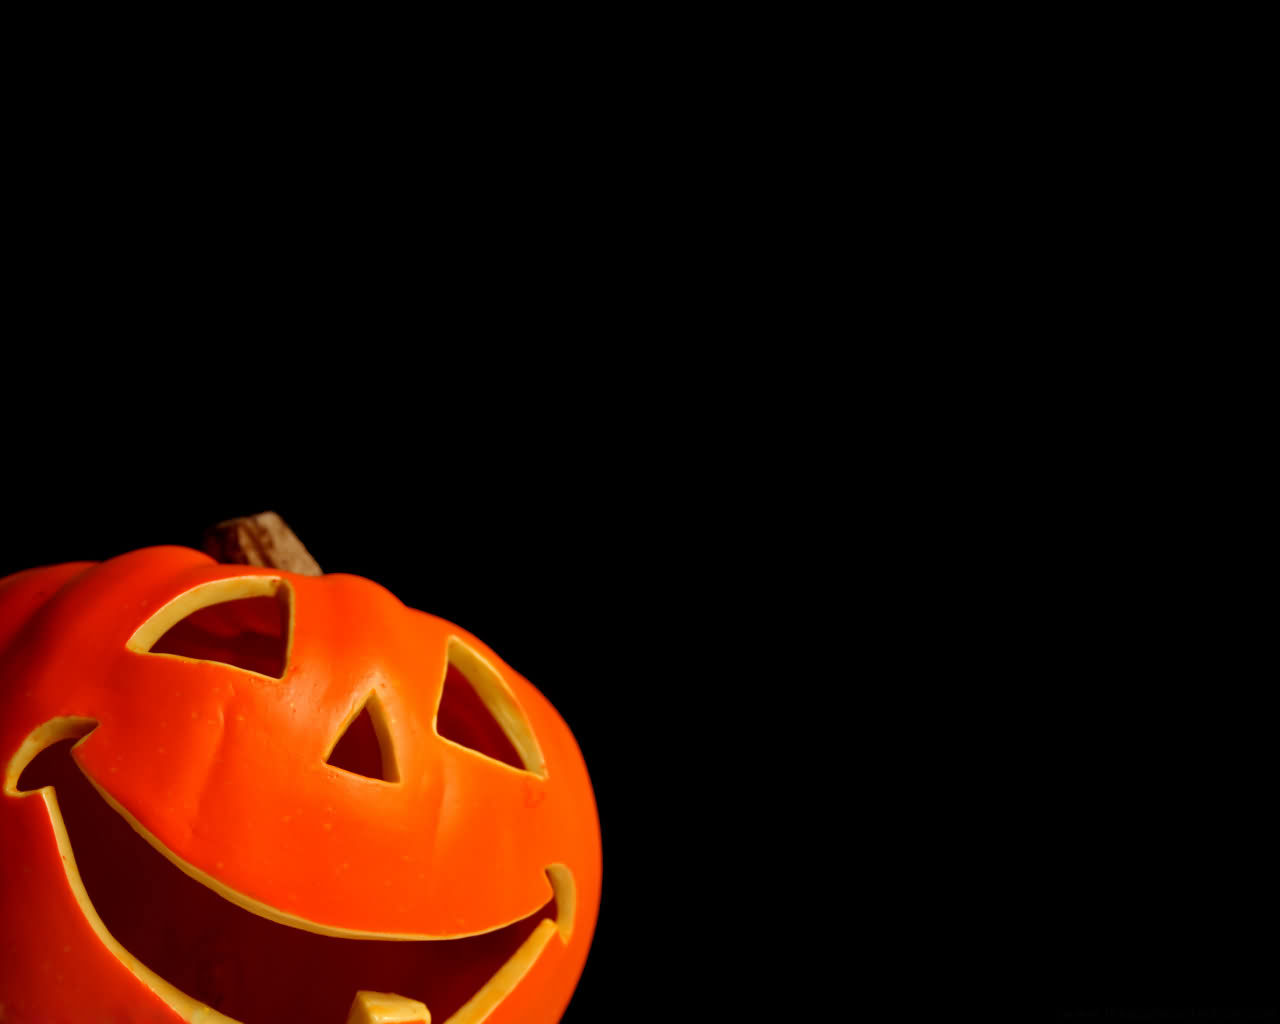 Celebrate With Pumkin Art Halloween Day 2020